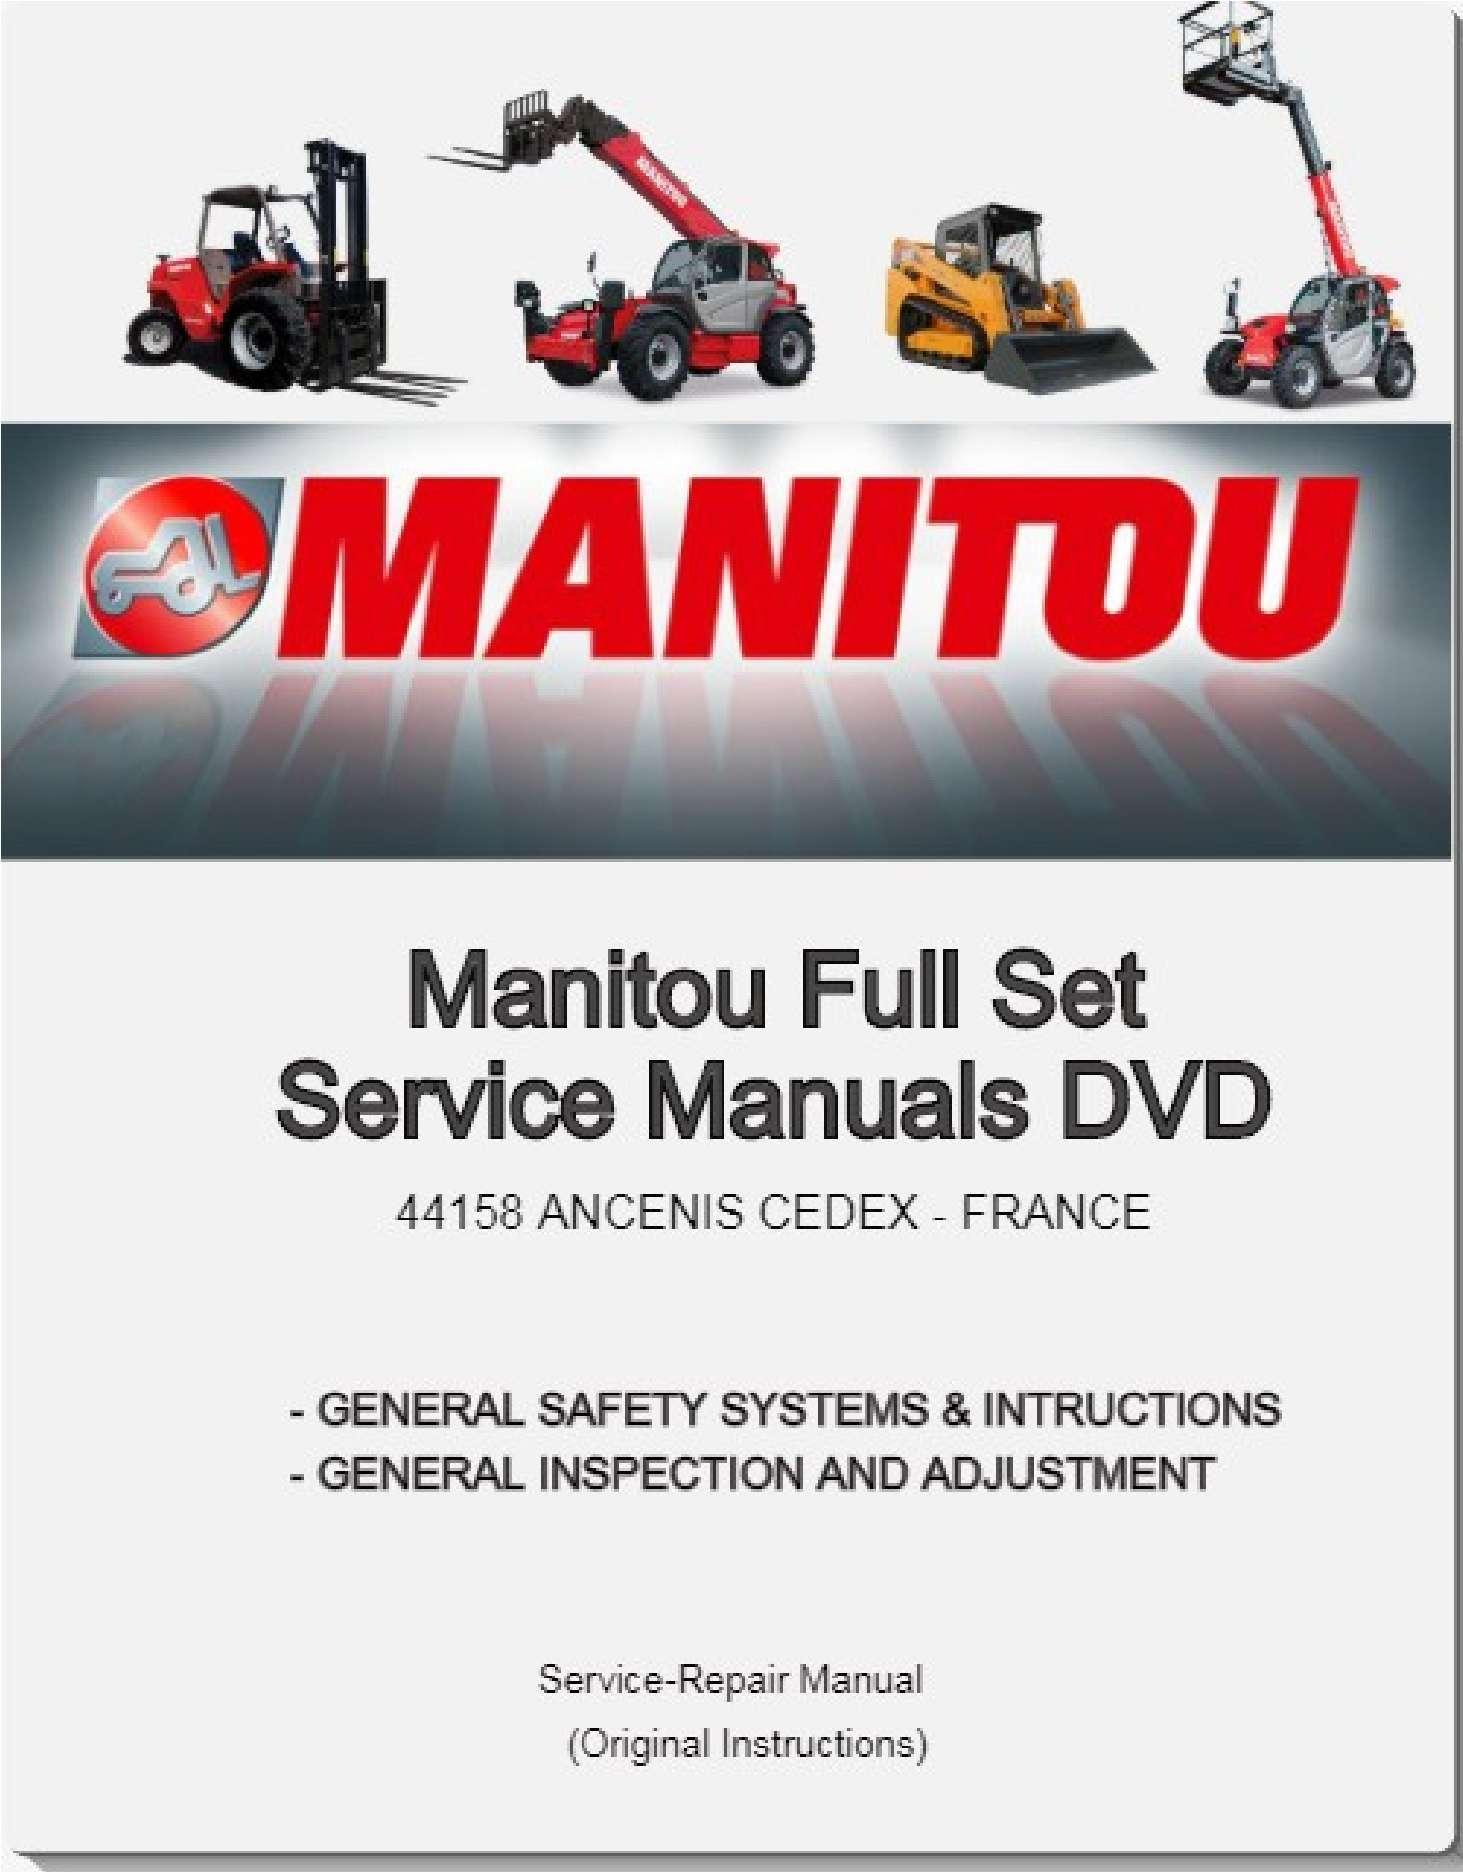 Manitou EPC + Service Manuals PDF SS-01